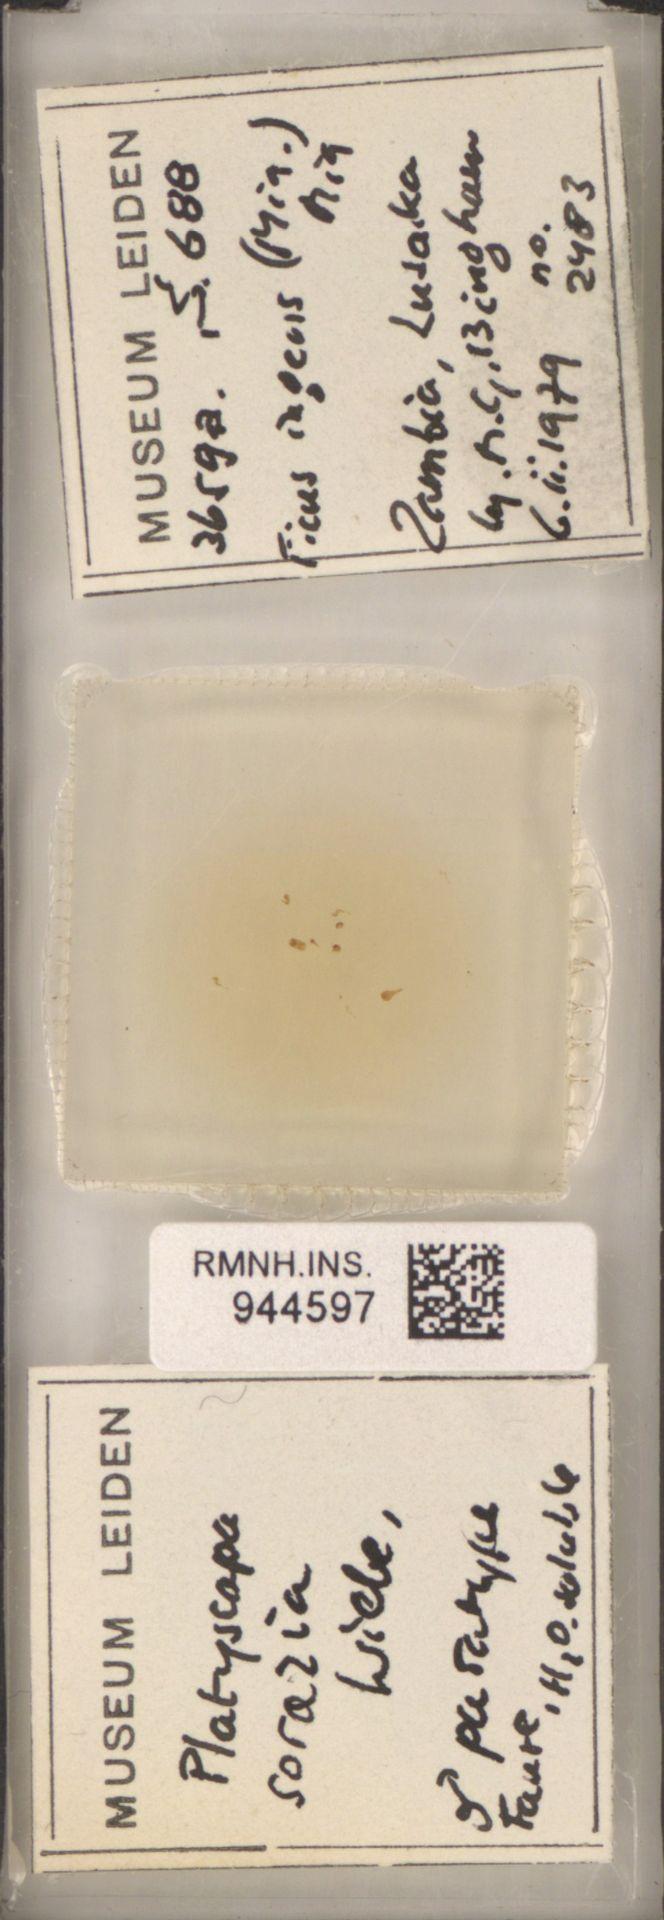 RMNH.INS.944597 | Platyscapa soraria Wiebes